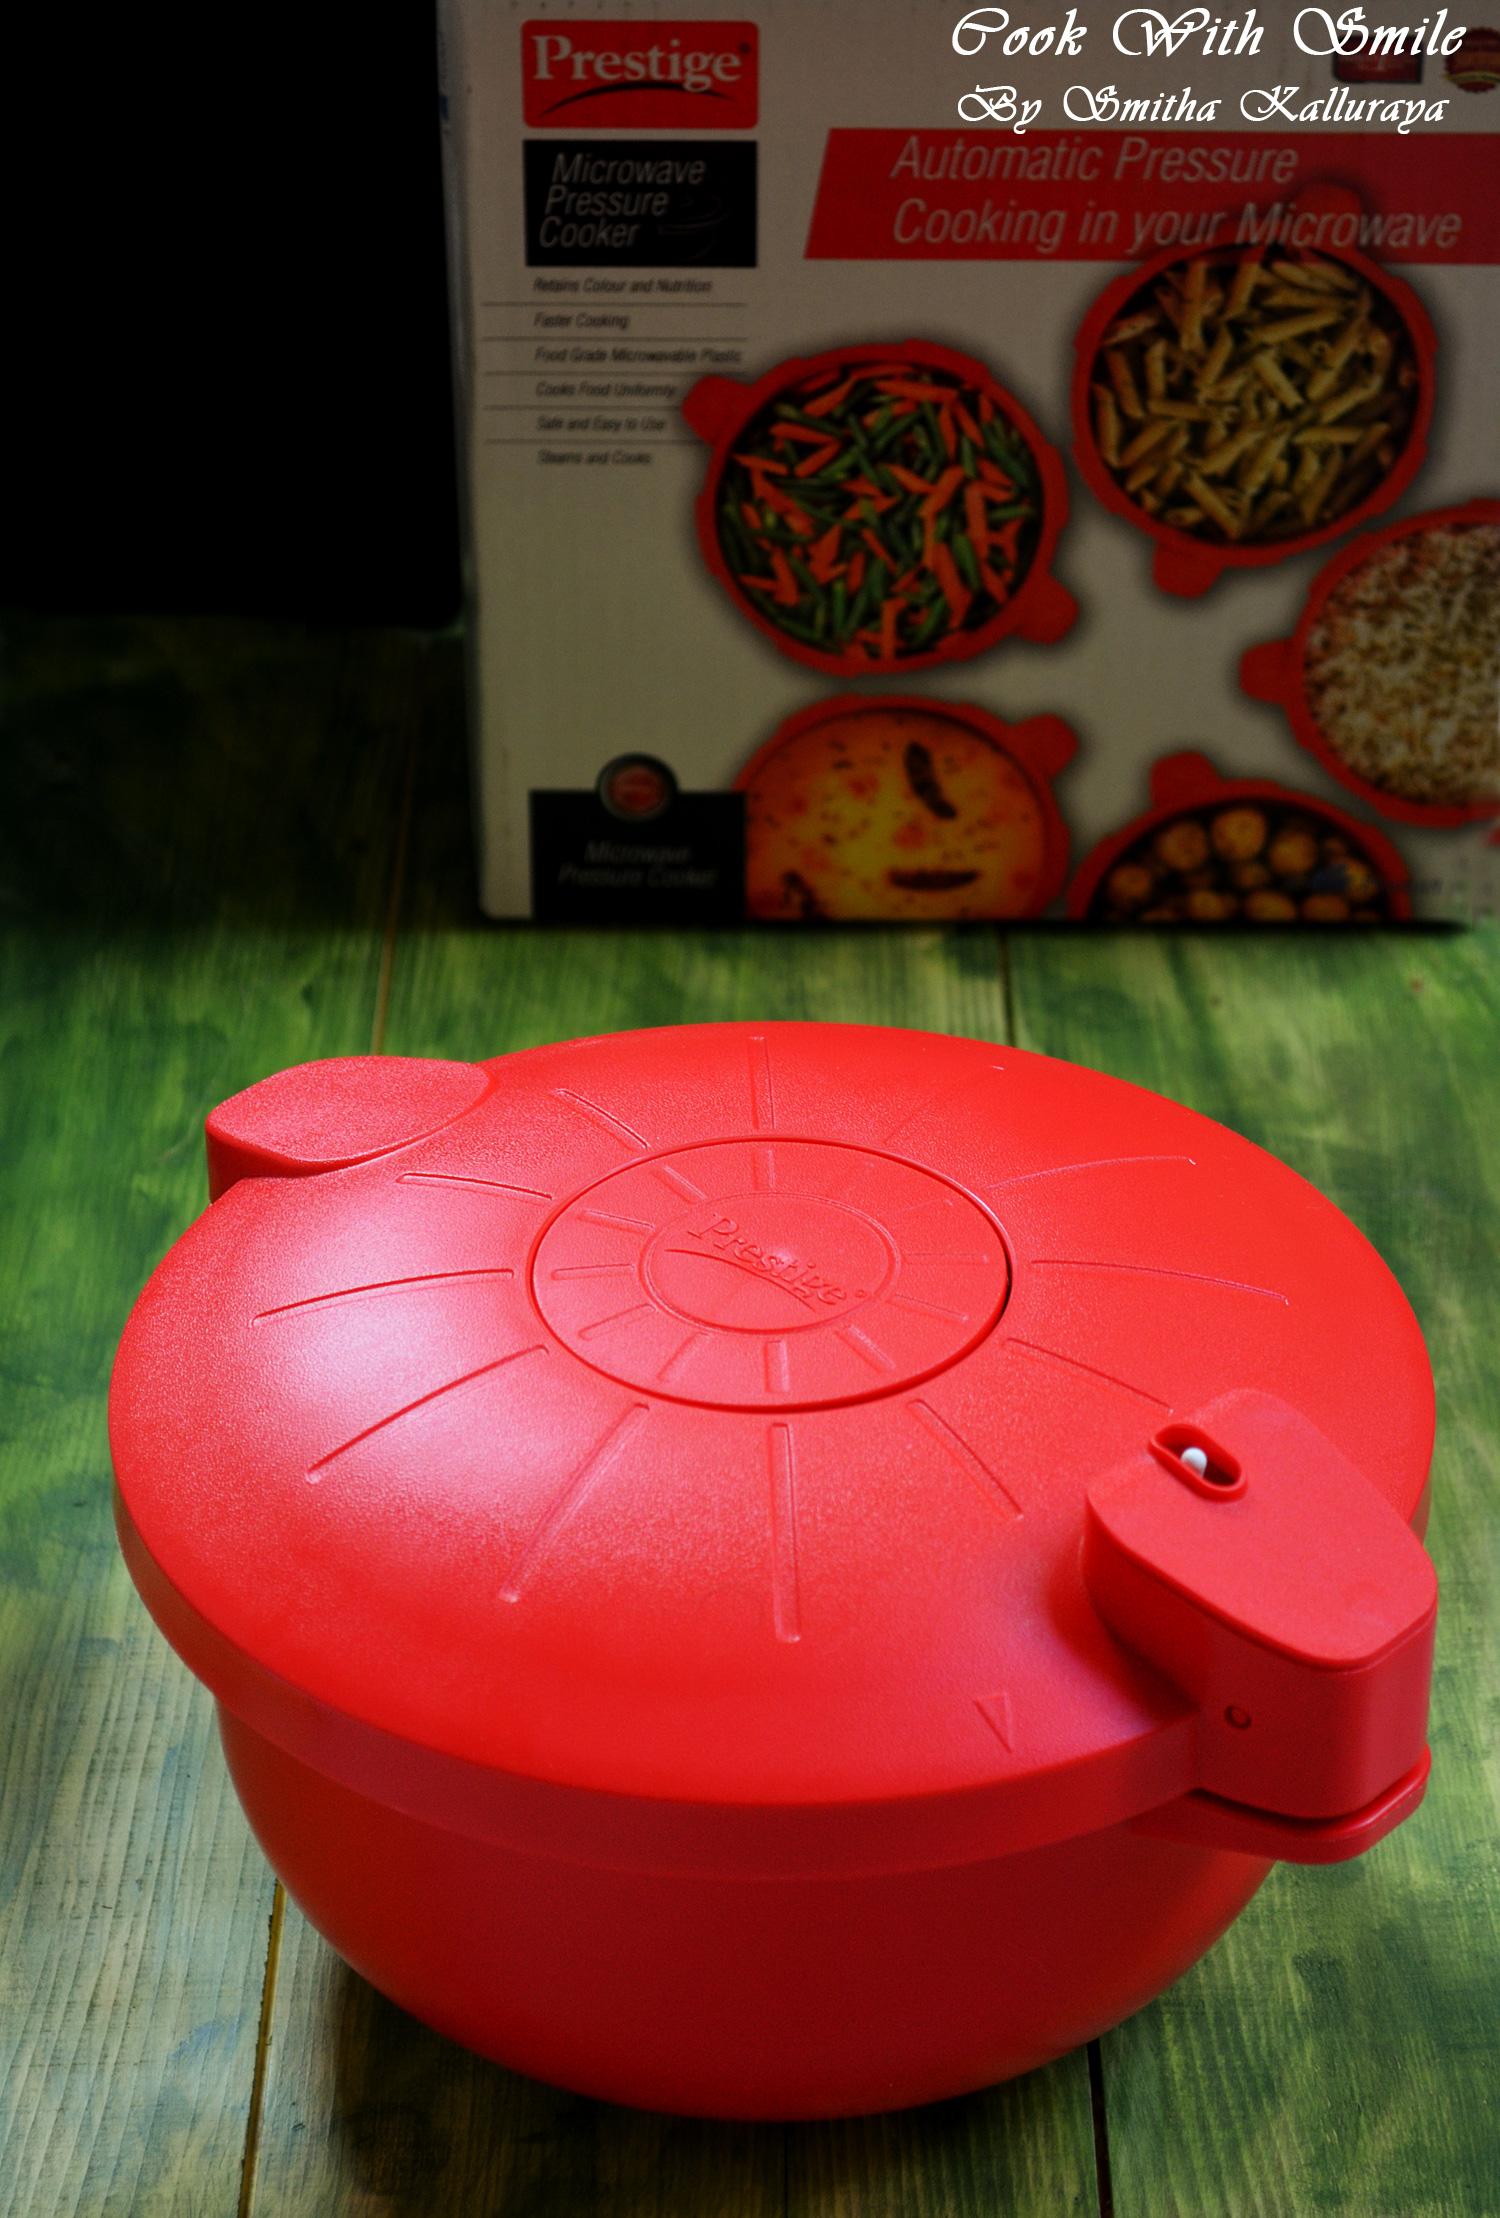 TTK Prestige microwave pressure cooker